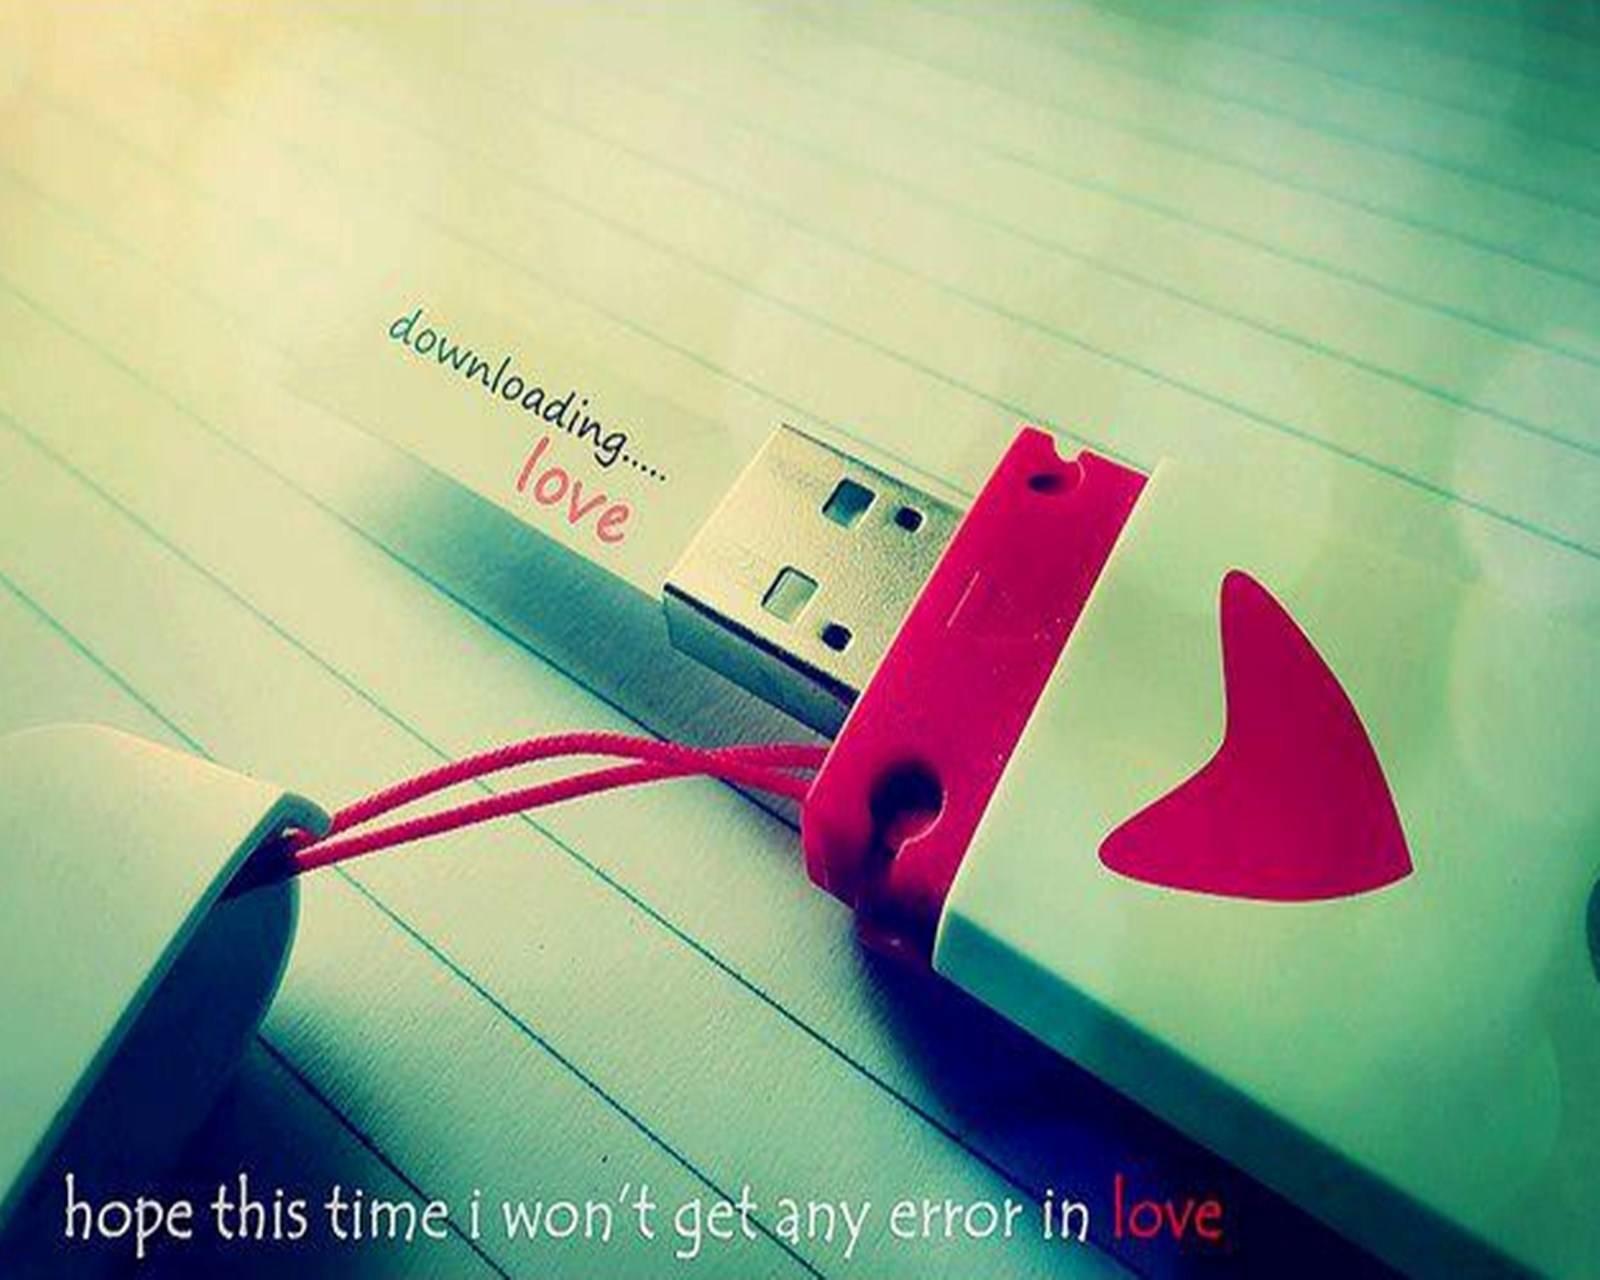 Downloading Love